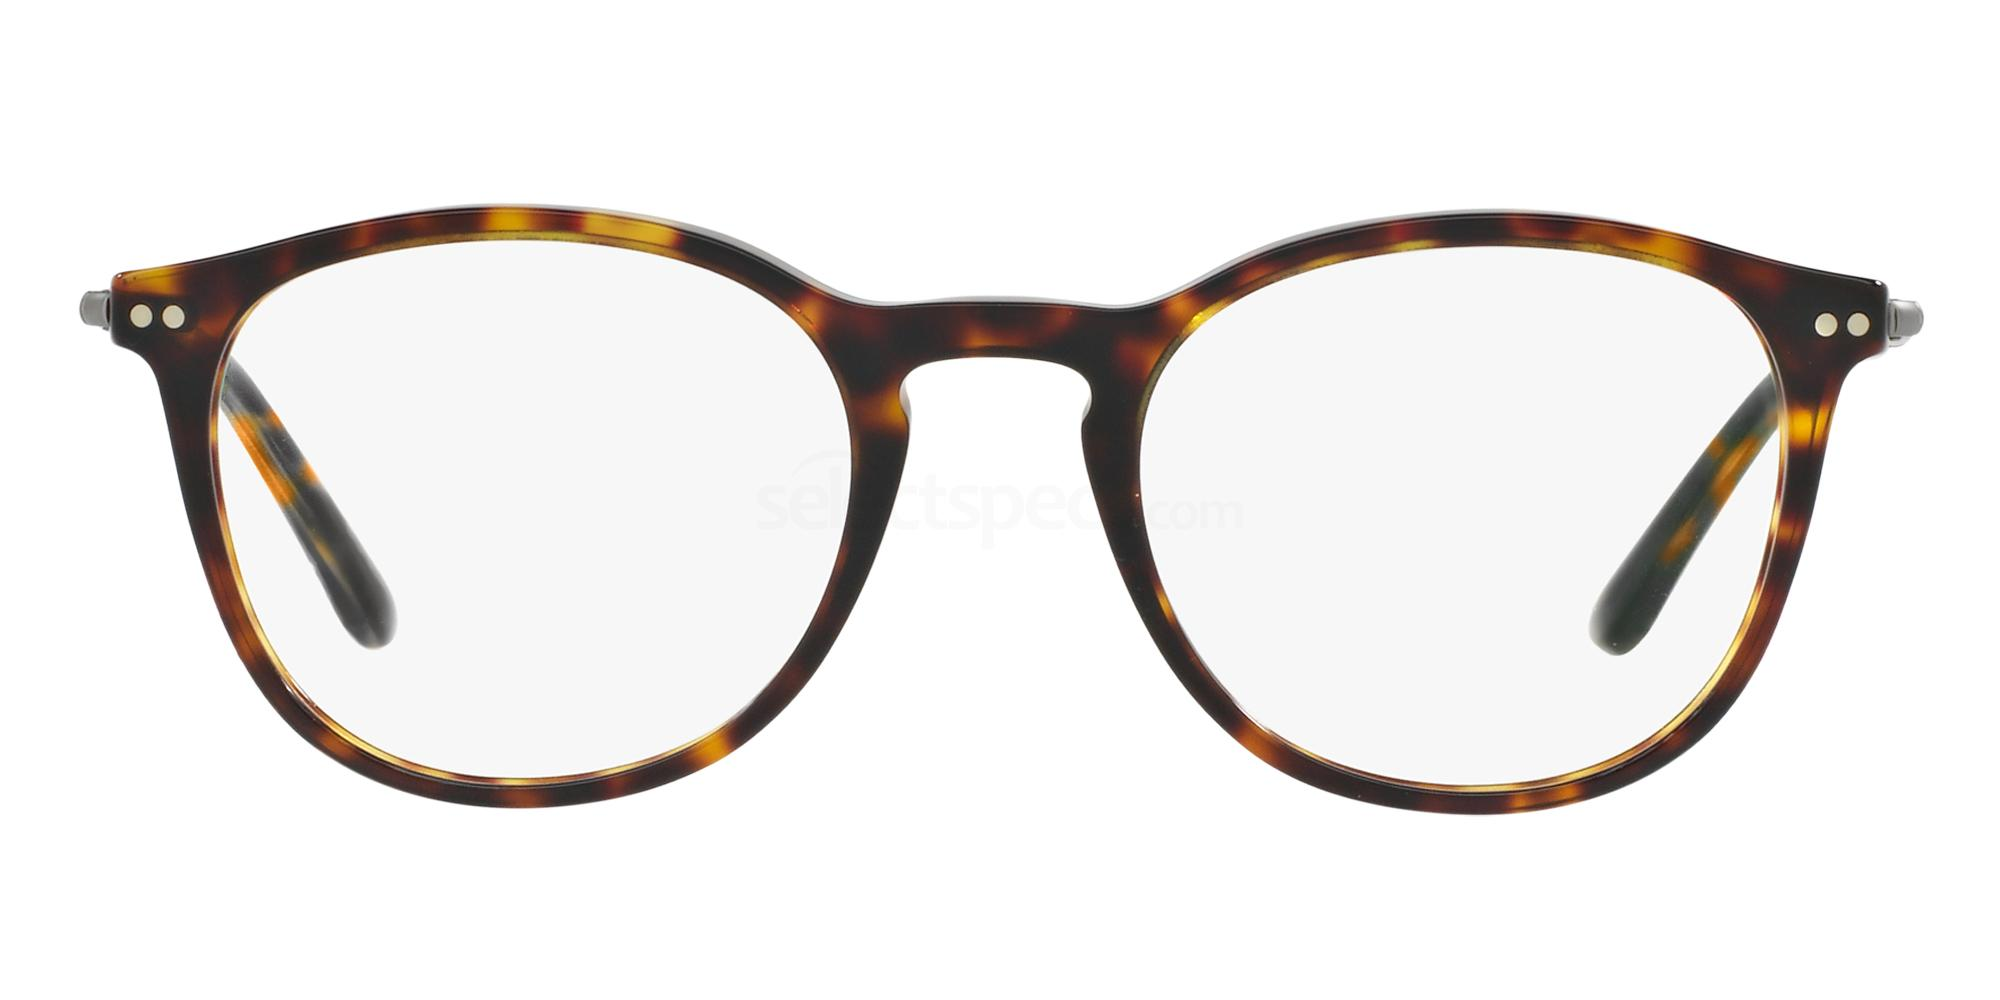 4ab7ddc9040 Giorgio Armani AR7125 glasses